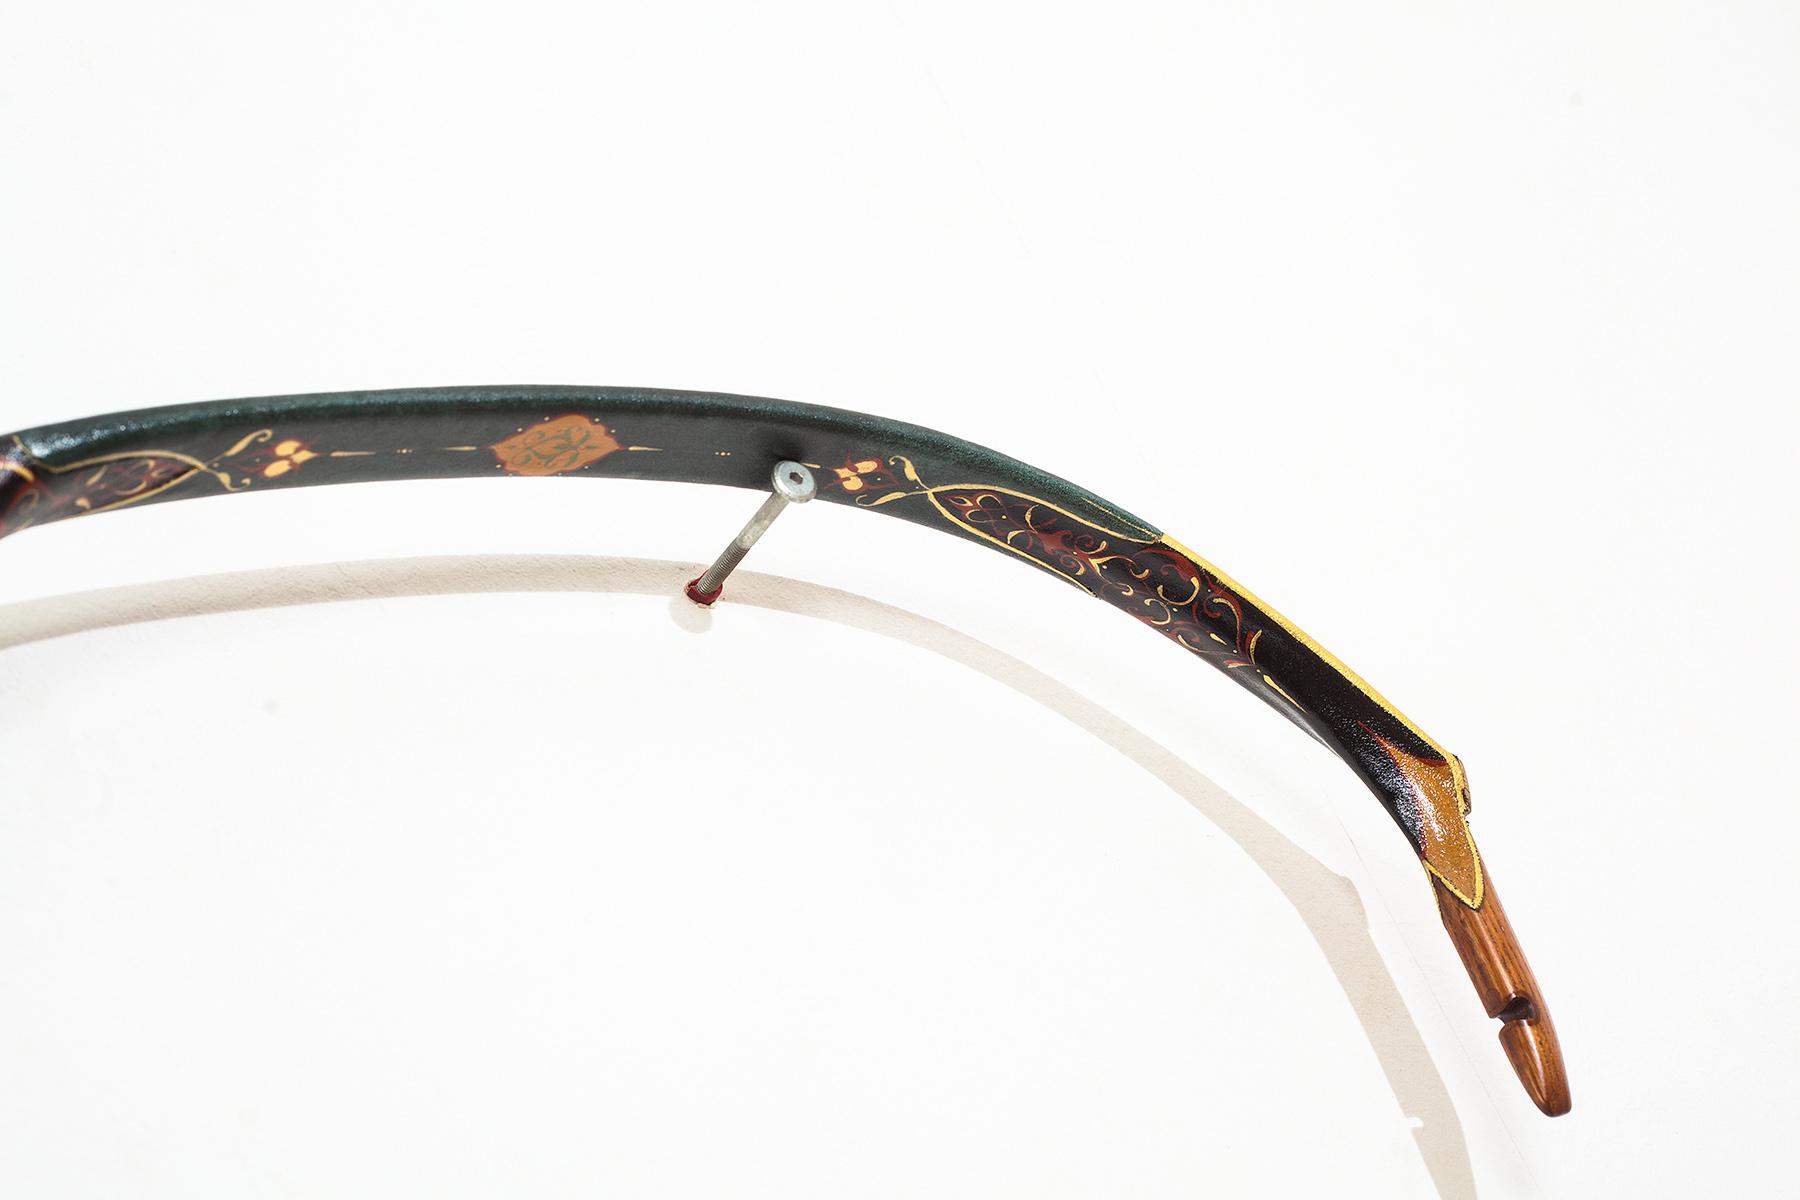 Grozer Ottoman painted composite bow